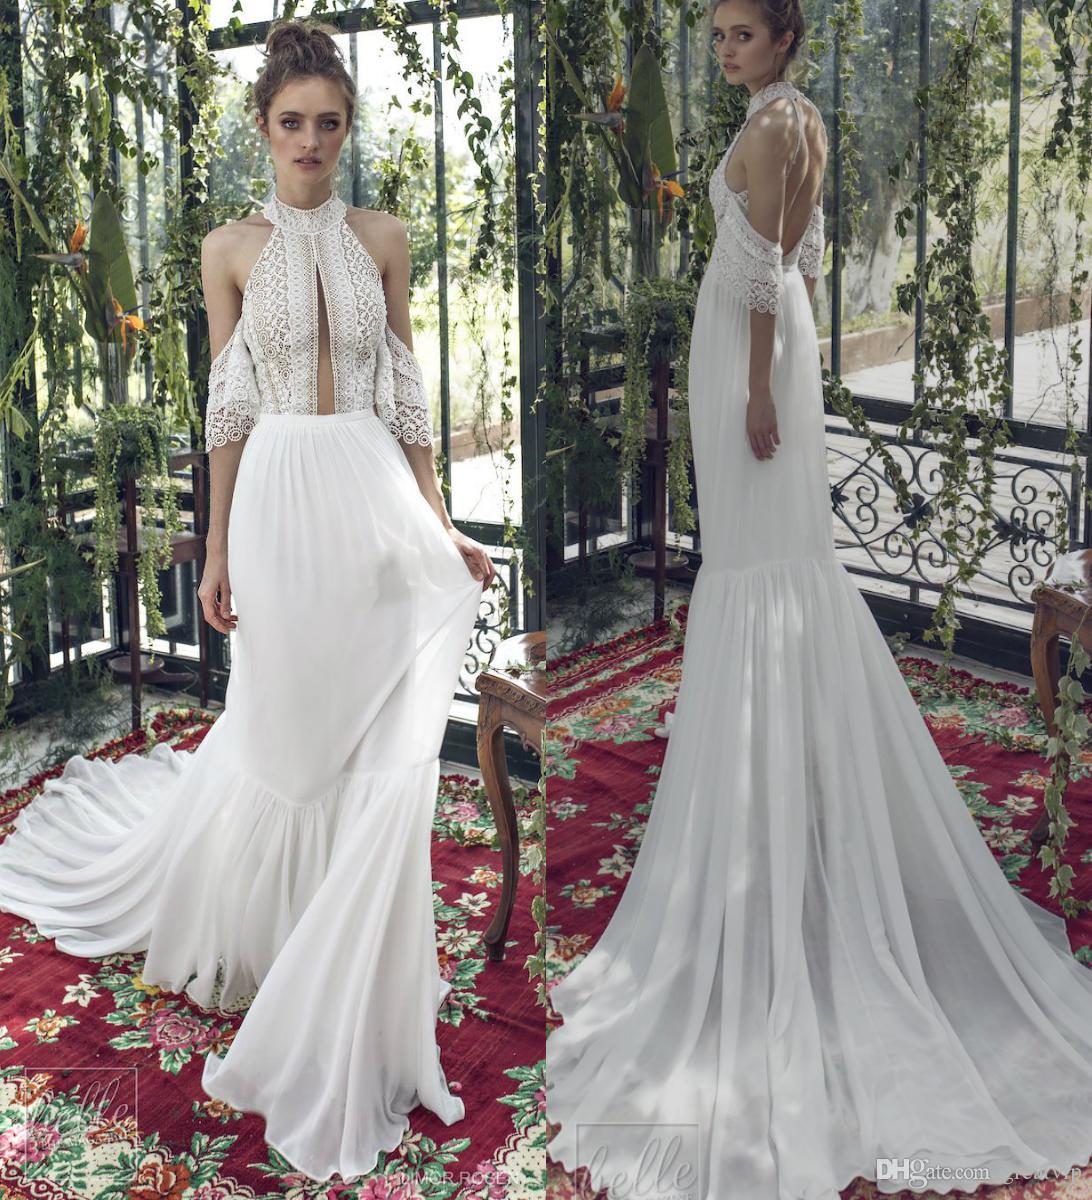 Limor Rosen 2019 Wedding Dresses Halter Lace Chiffon Applique Backless Train Plus Size Wedding Dress Beach Boho Bridal Gowns Robe De Mariée